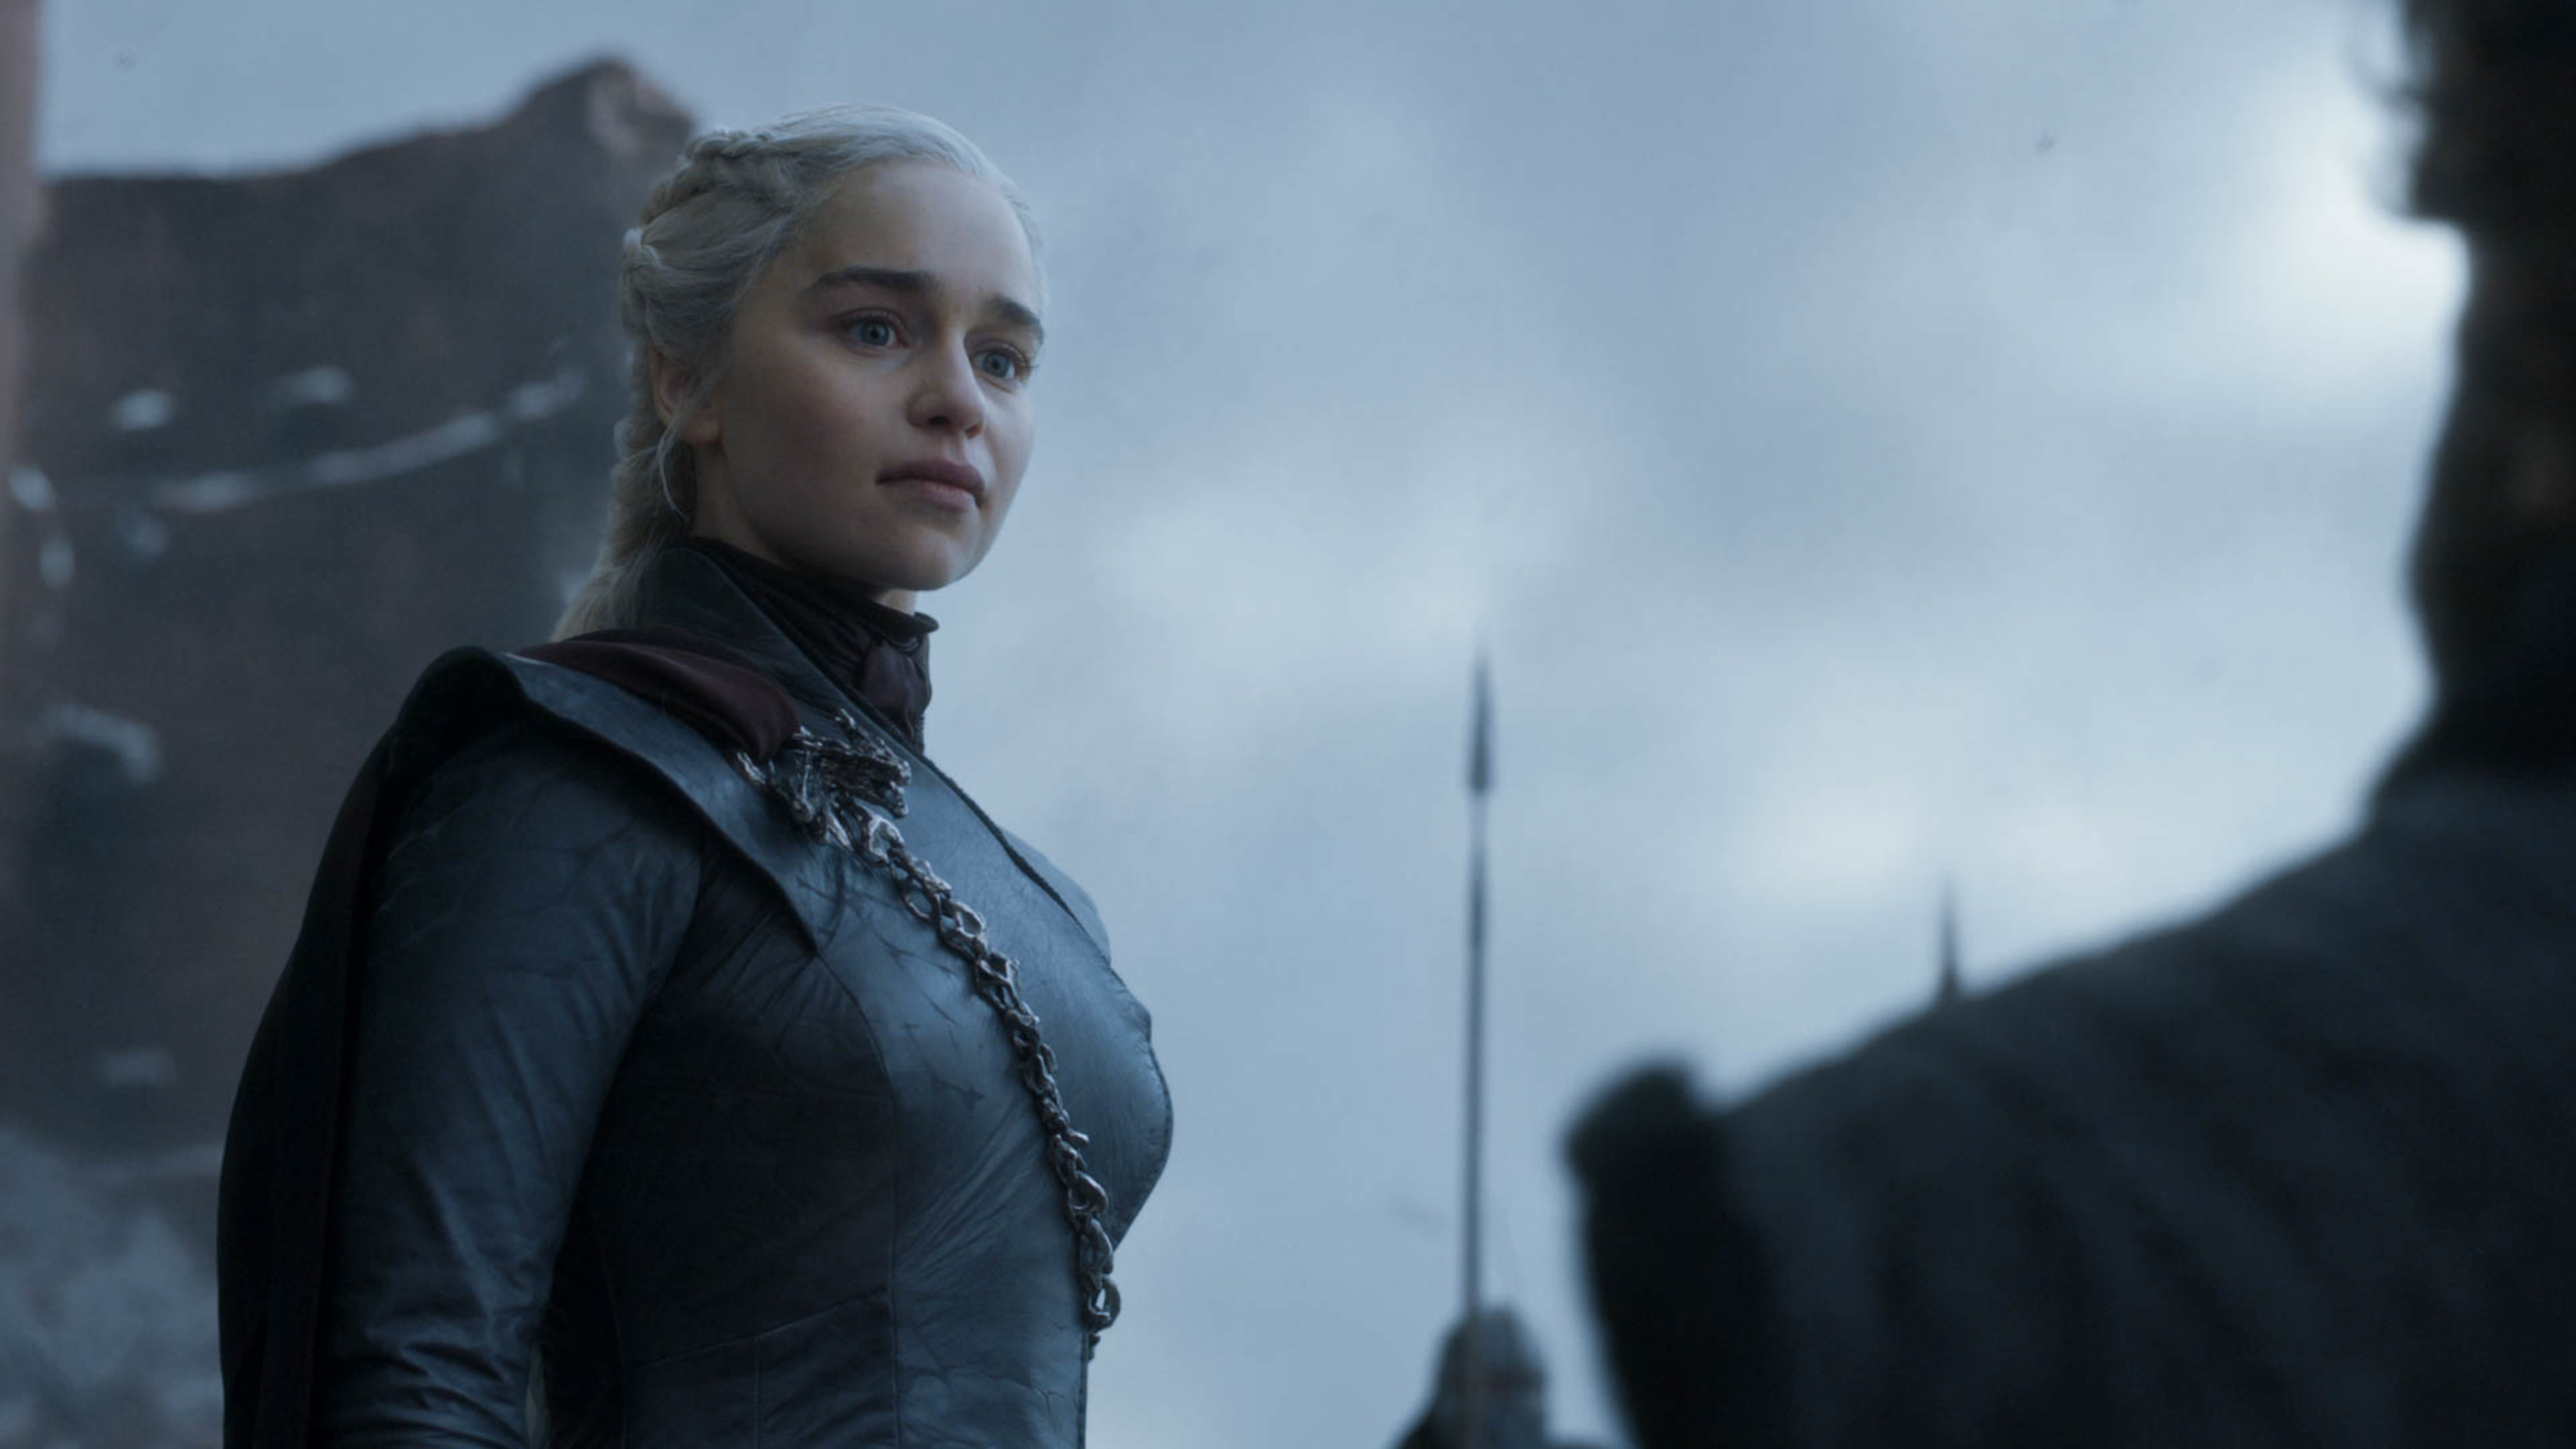 Daenerys Targaryen (Emilia Clarke) after her rousing speech in the series finale of 'Game of Thrones.'